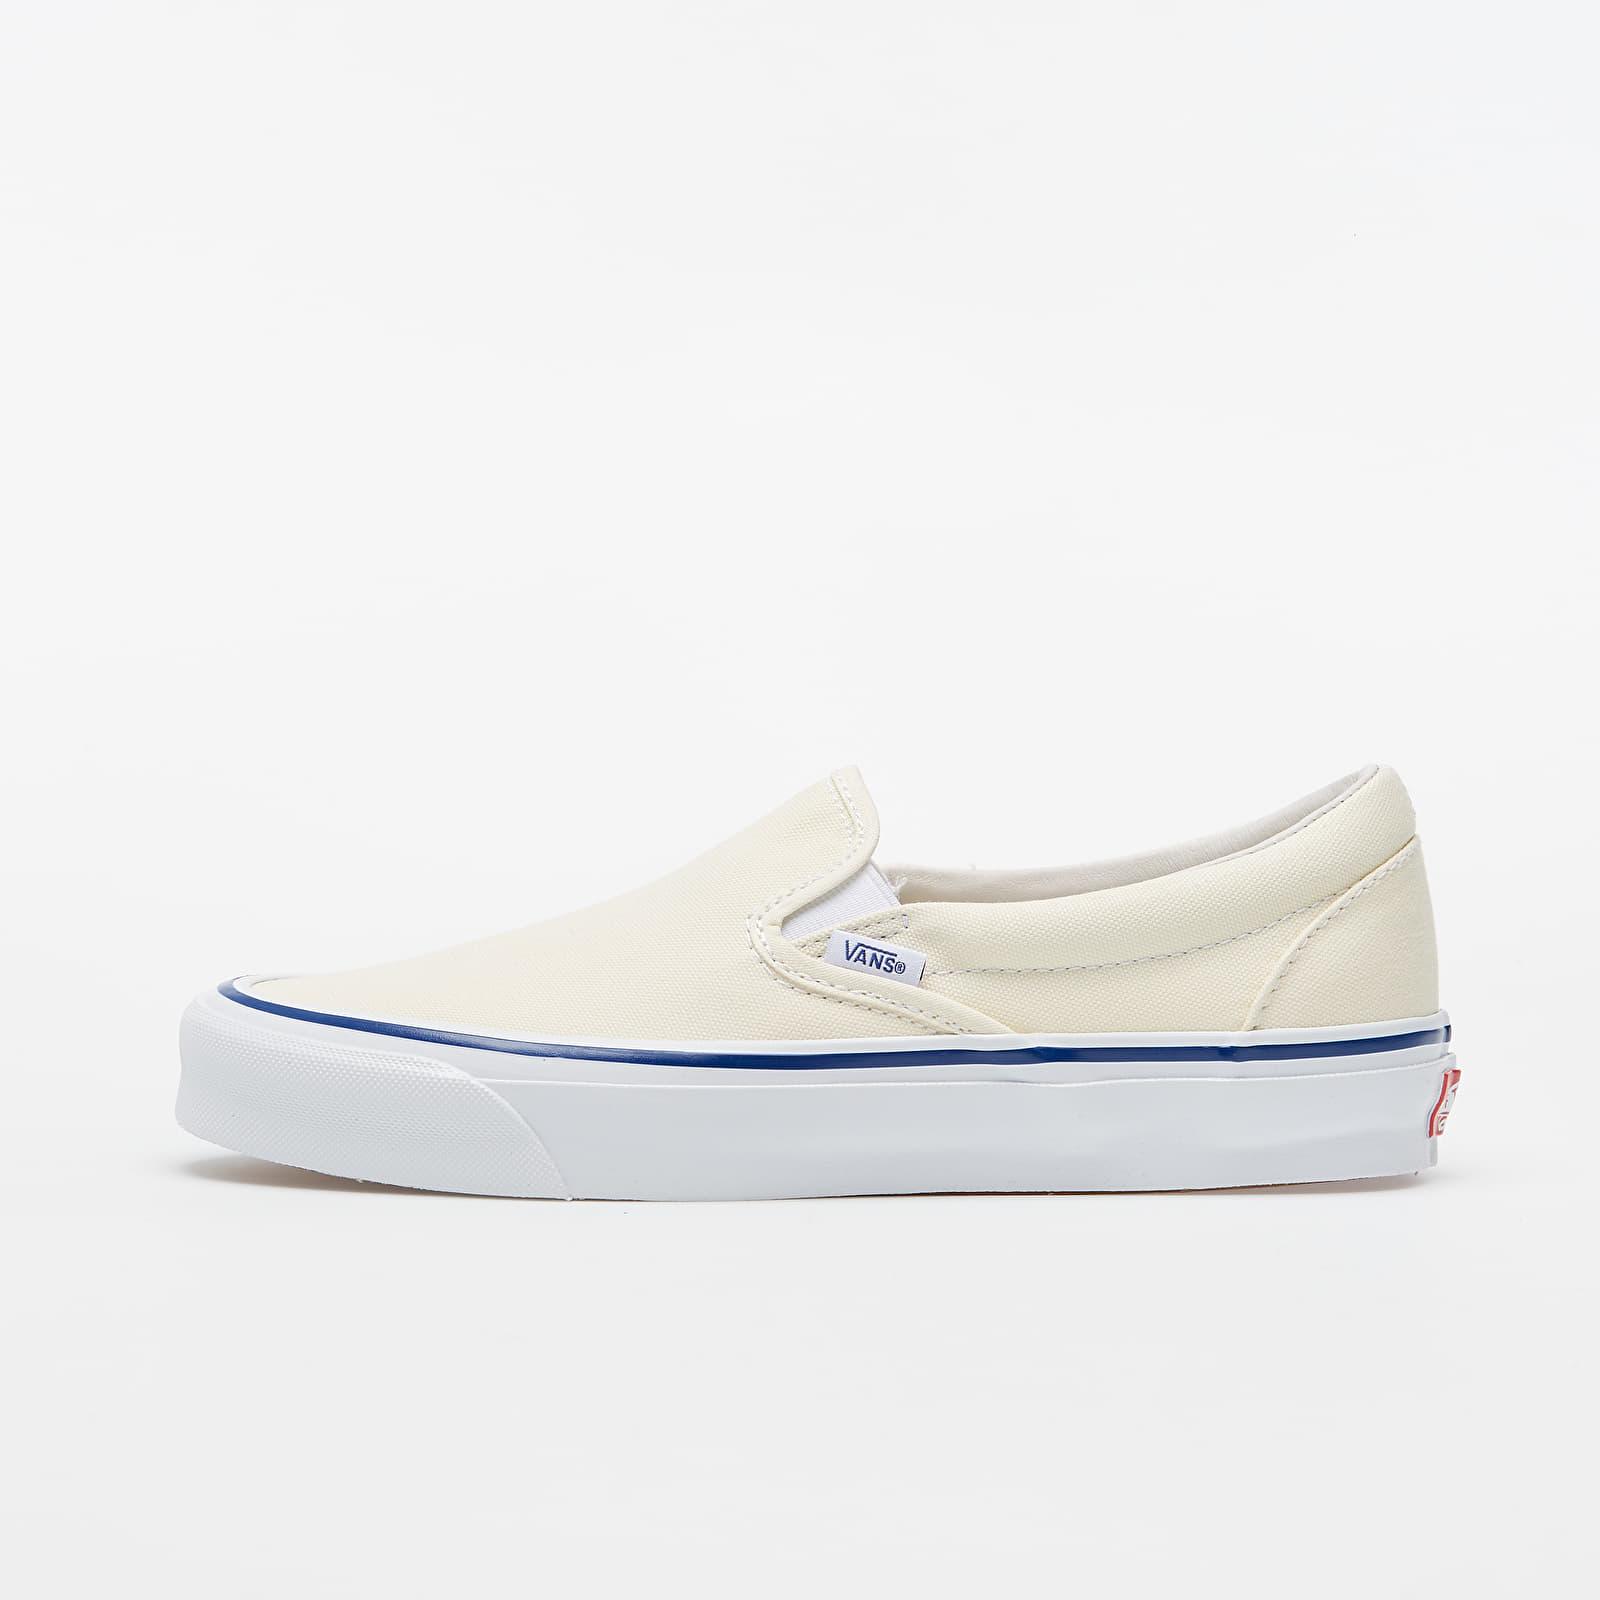 Chaussures et baskets homme Vans OG Classic Slip-On (Canvas) Classic